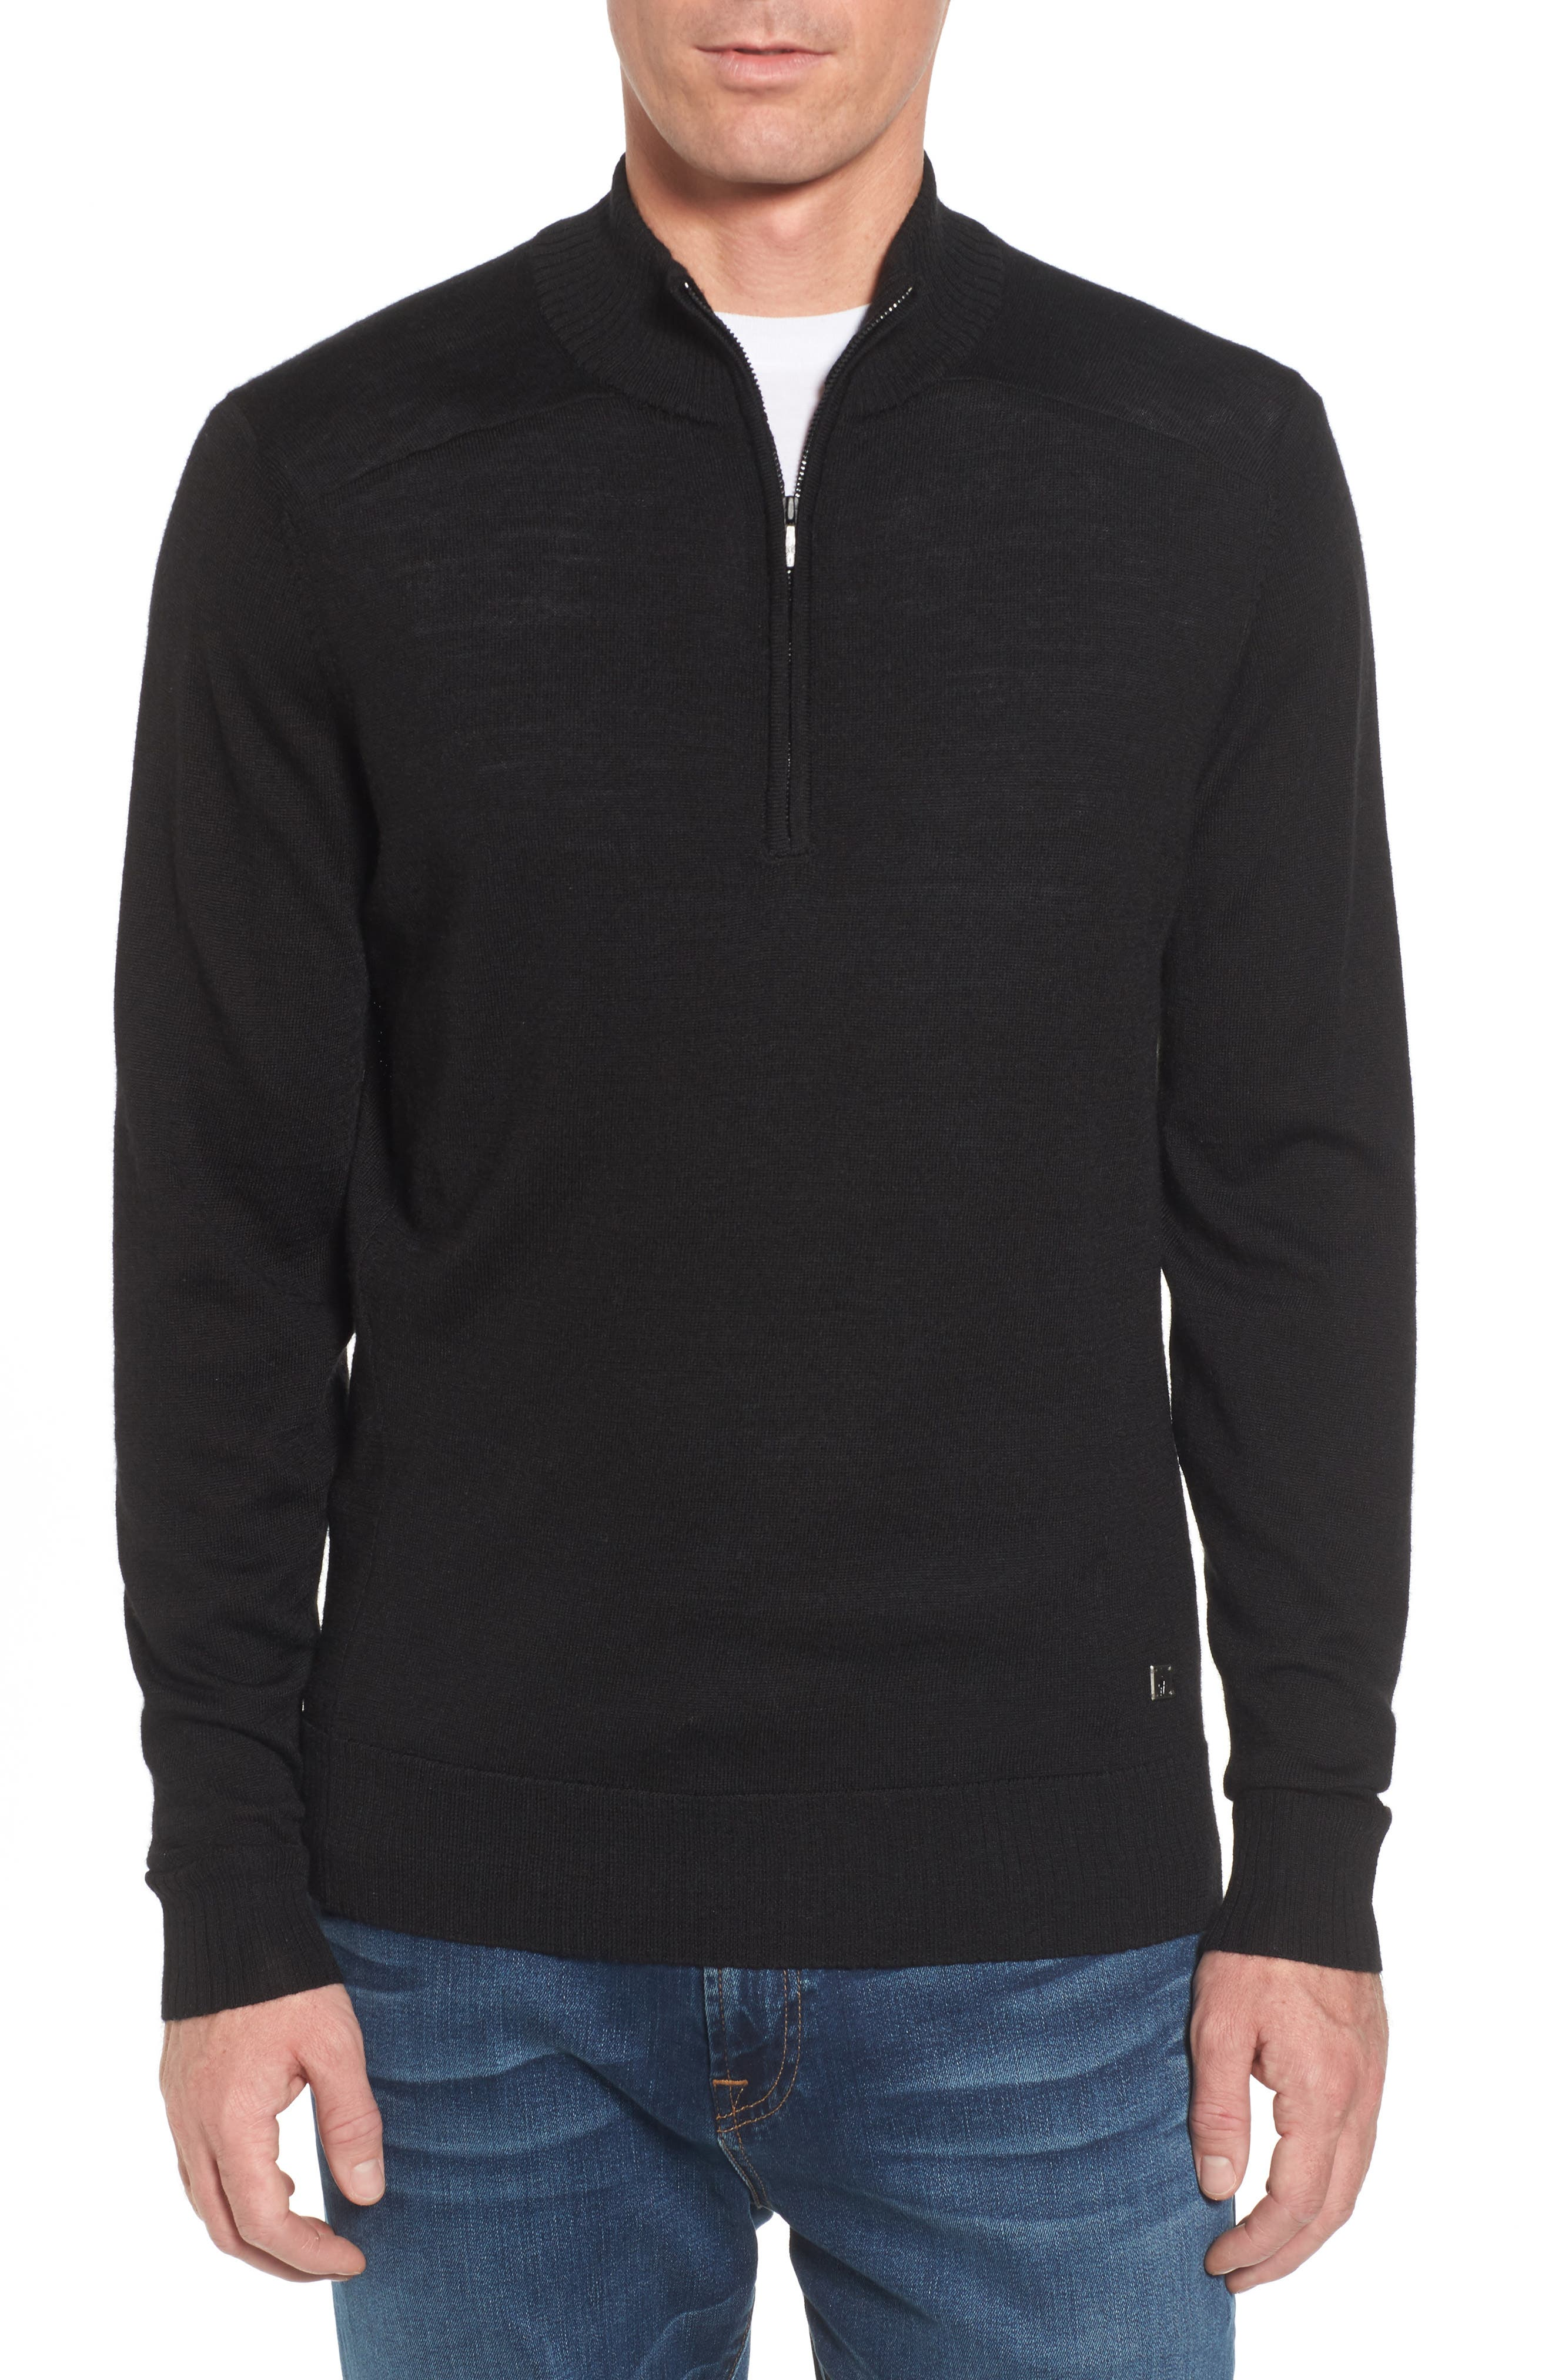 Kiva Ridge Merino Wool Blend Pullover,                         Main,                         color, 001